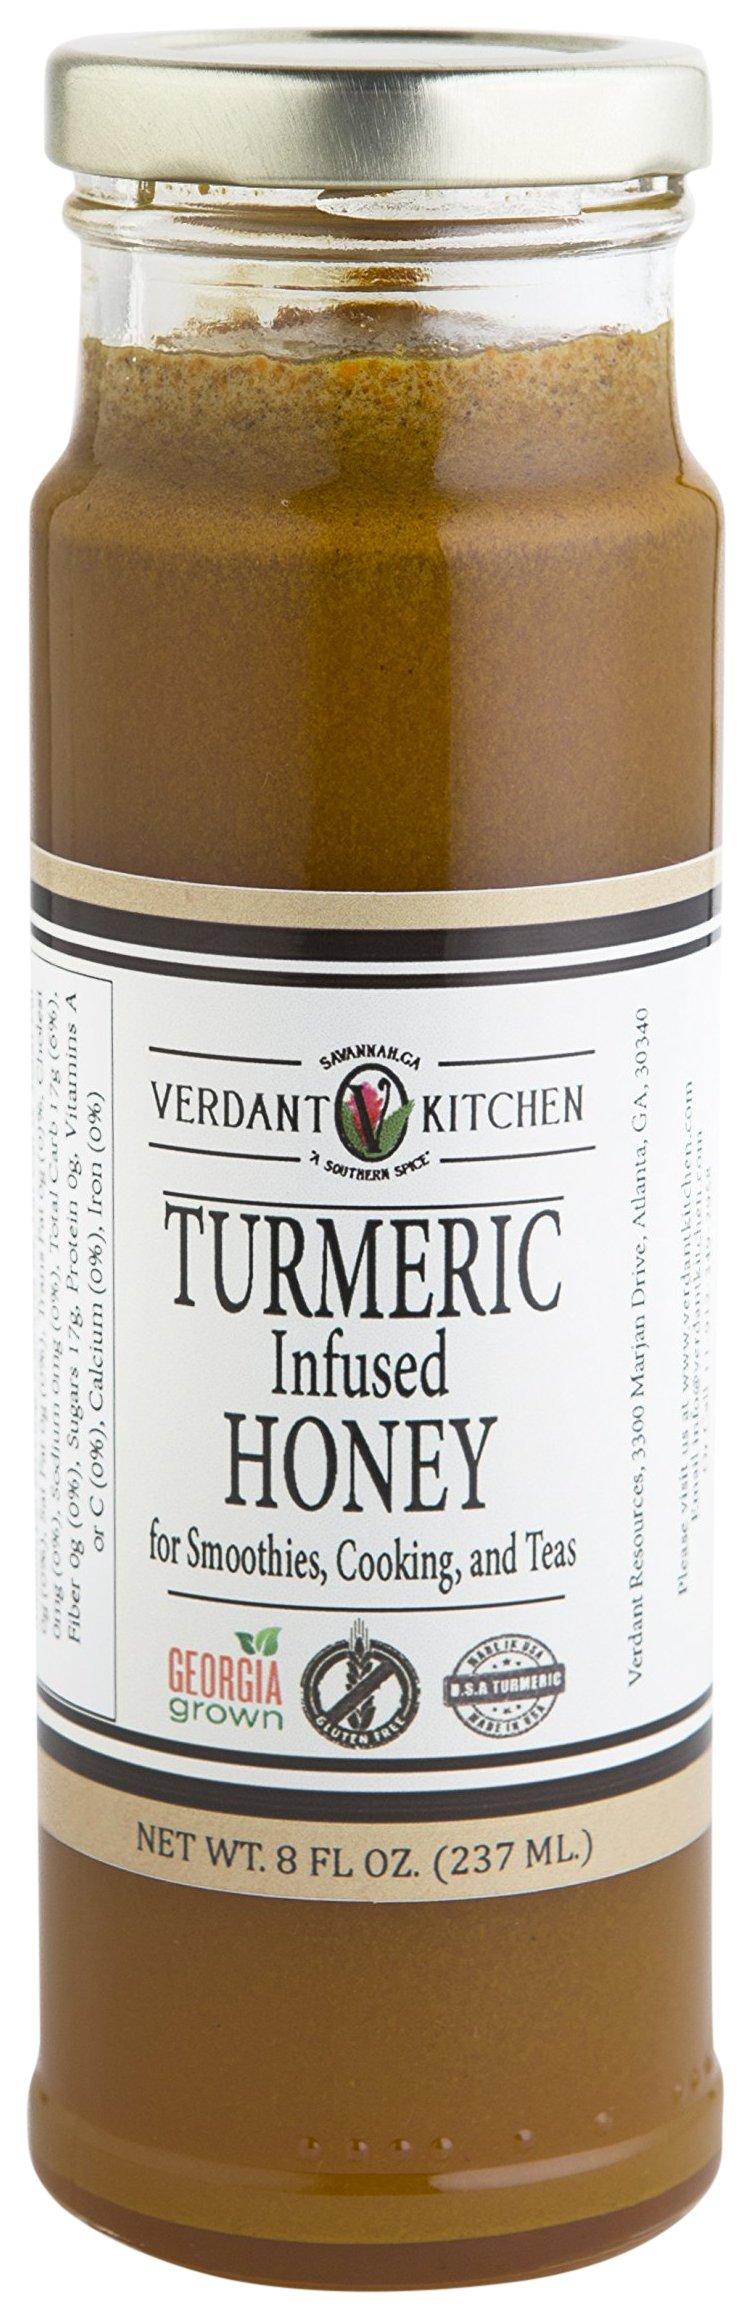 VERDANT KITCHEN Turmeric Infused Honey, 12 oz.